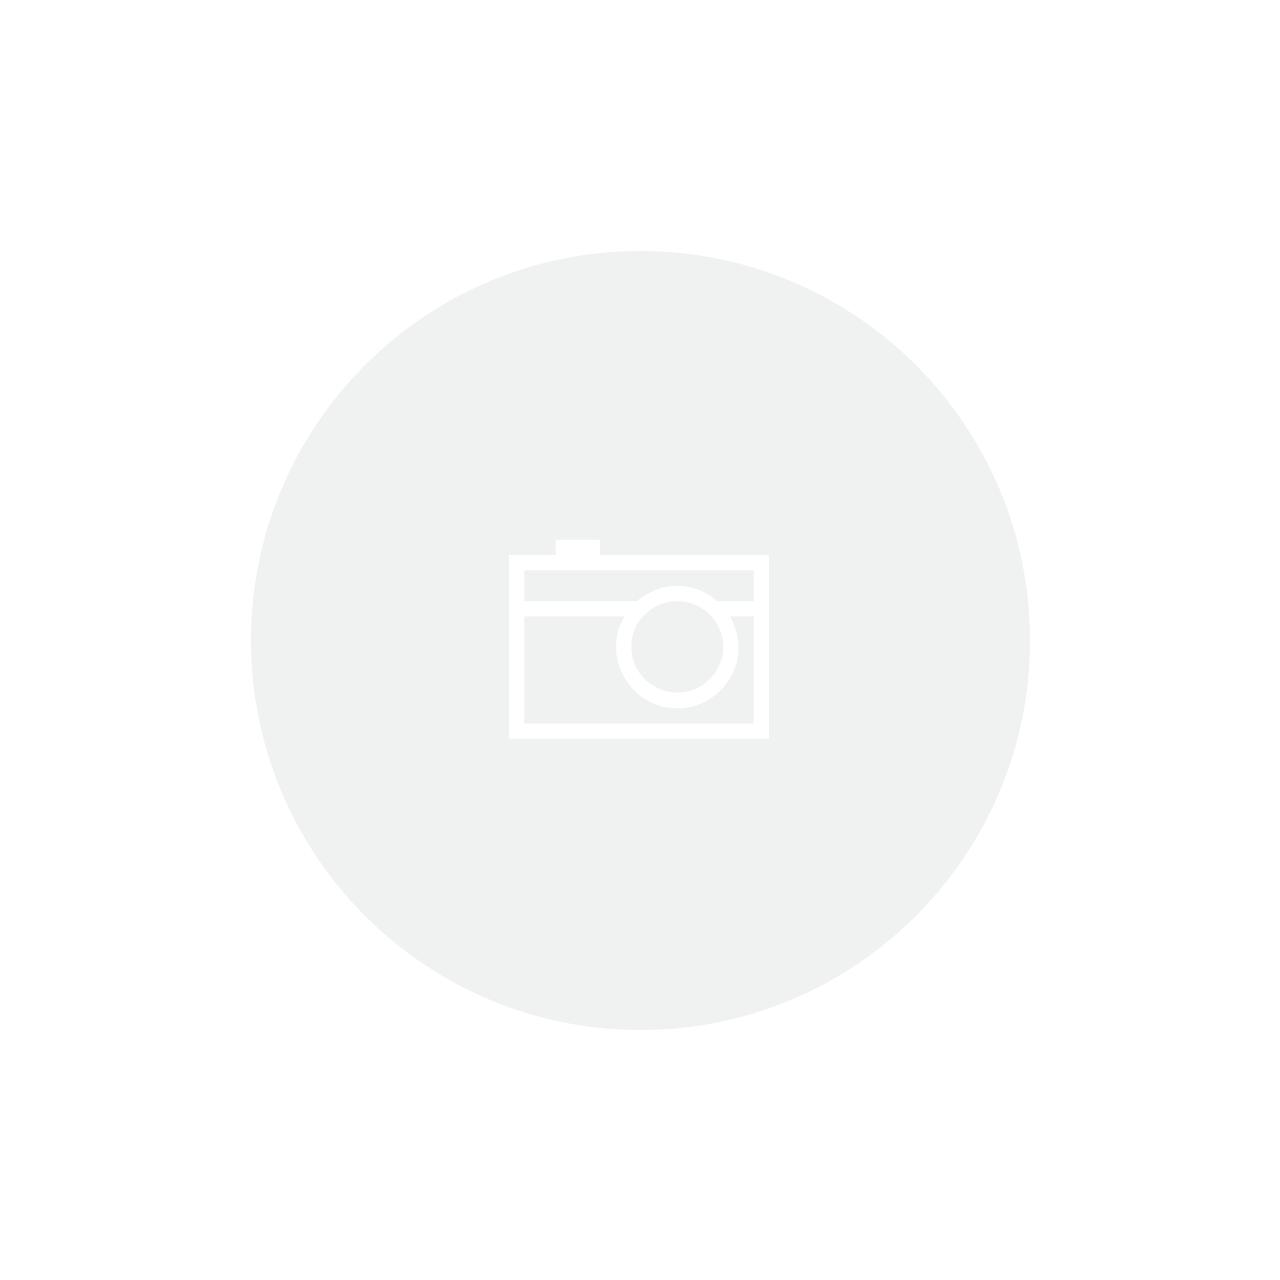 Papel Artesanal Indiano - Ref. 97